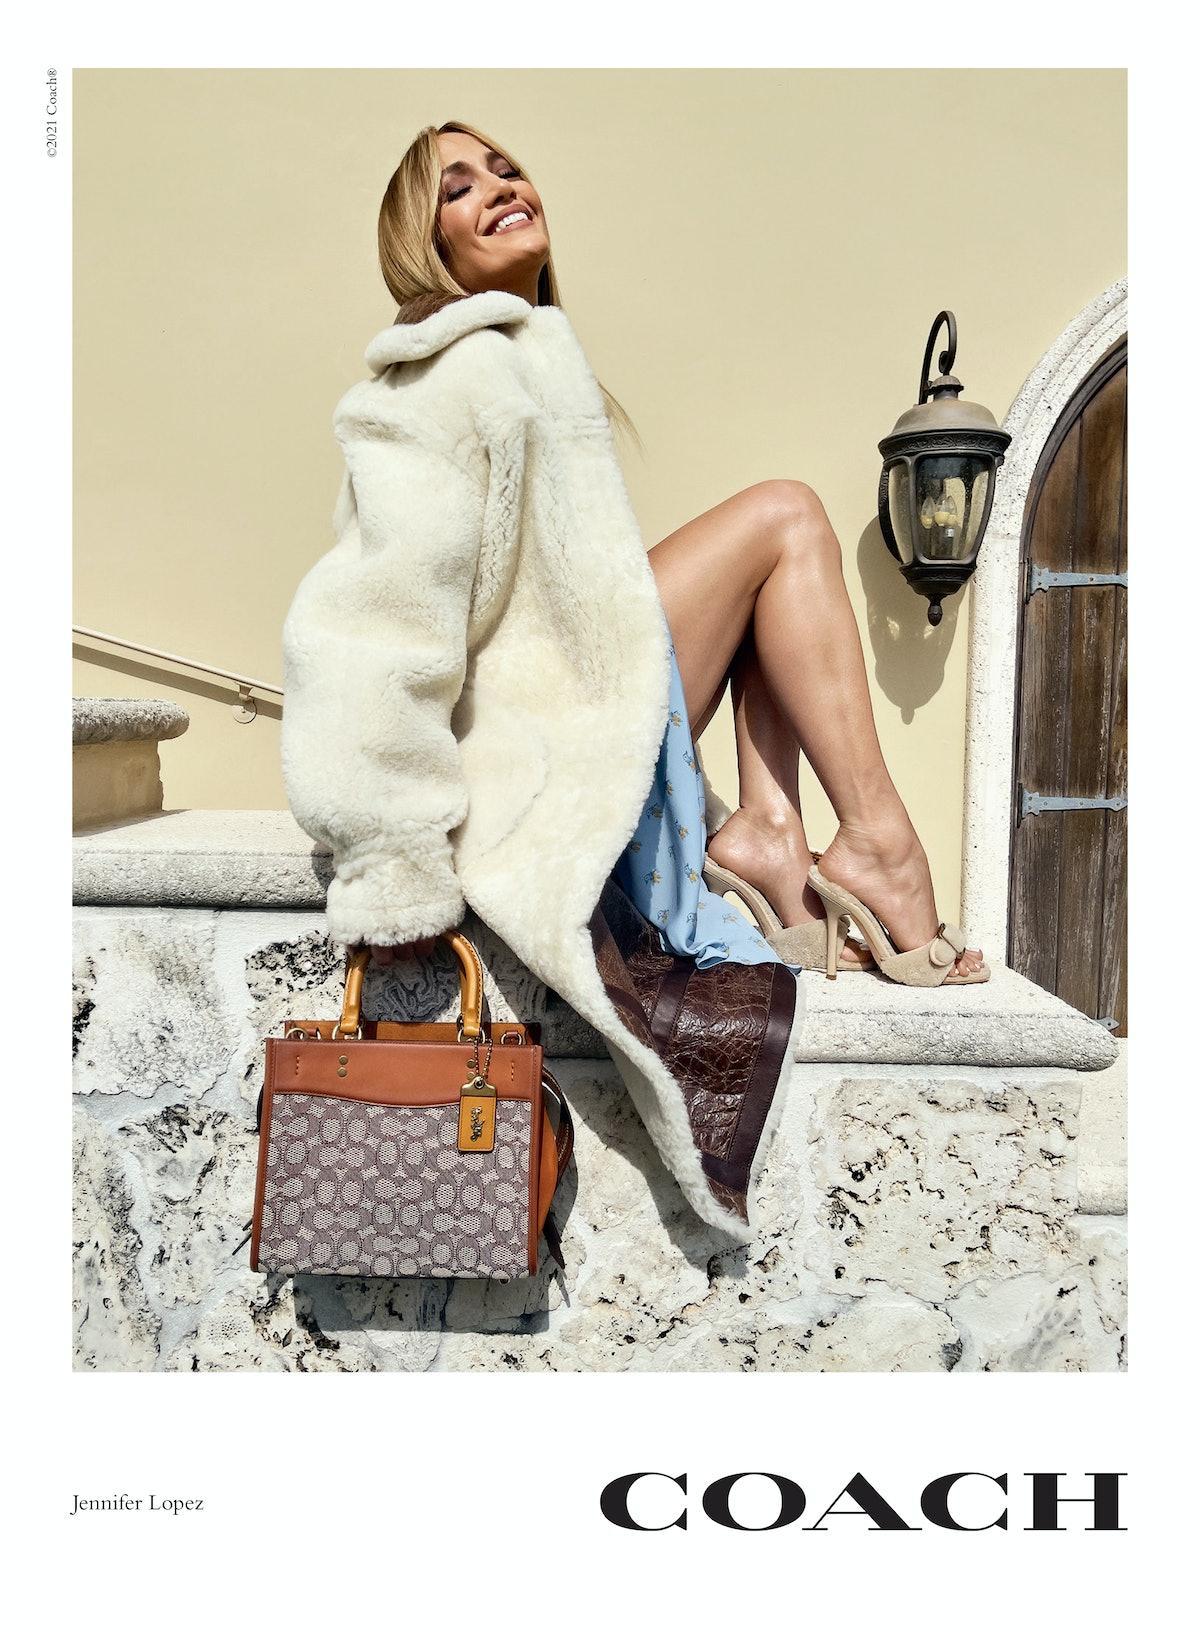 Jennifer Lopez stars in Coach's new Rogue bag campaign, carrying a Rogue 25 handbag in signature tex...